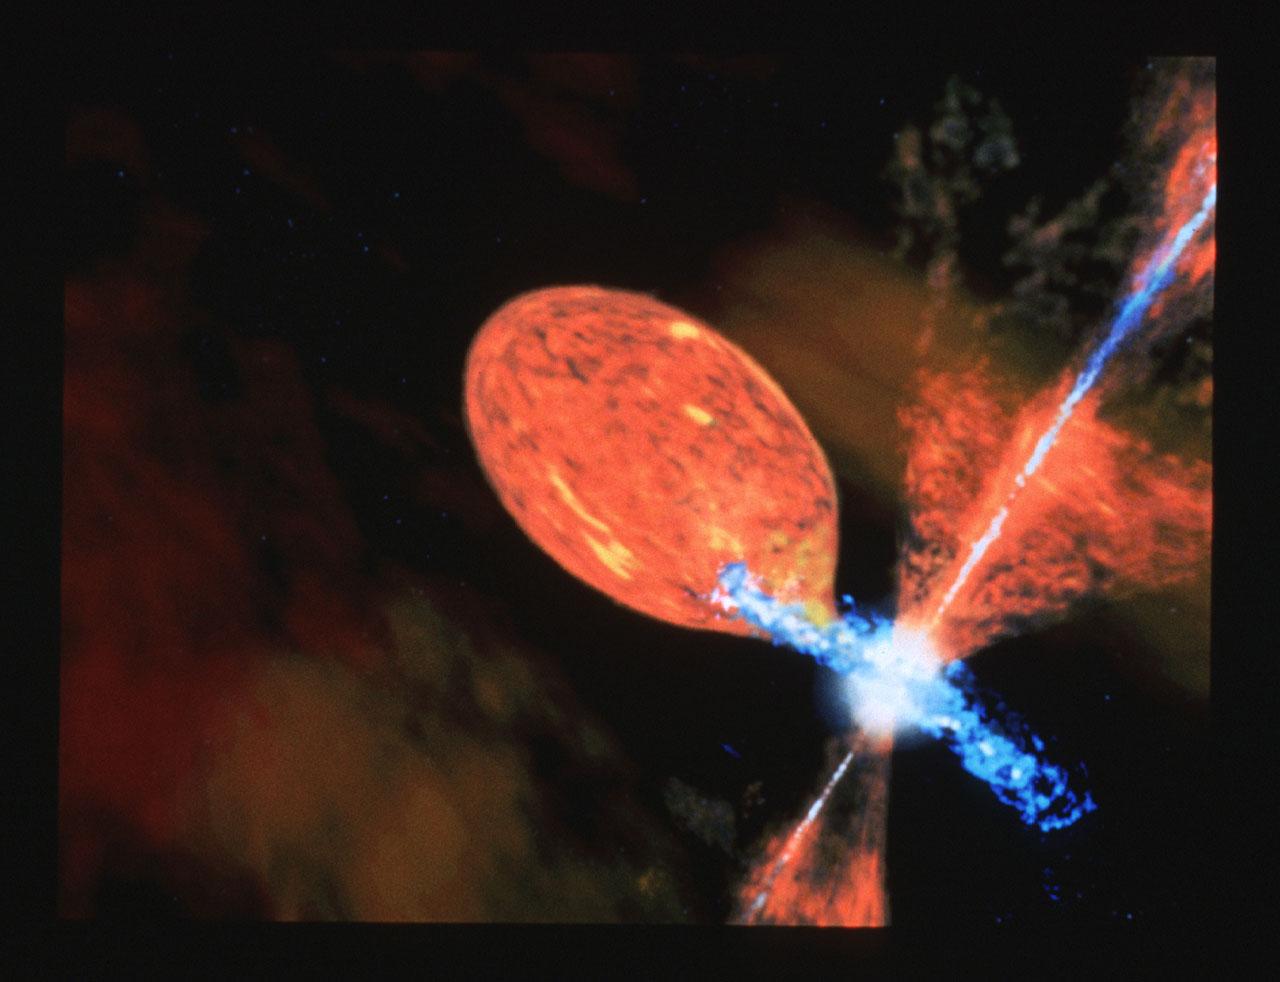 Symbiotic Star R Aquarii (artist's impression)